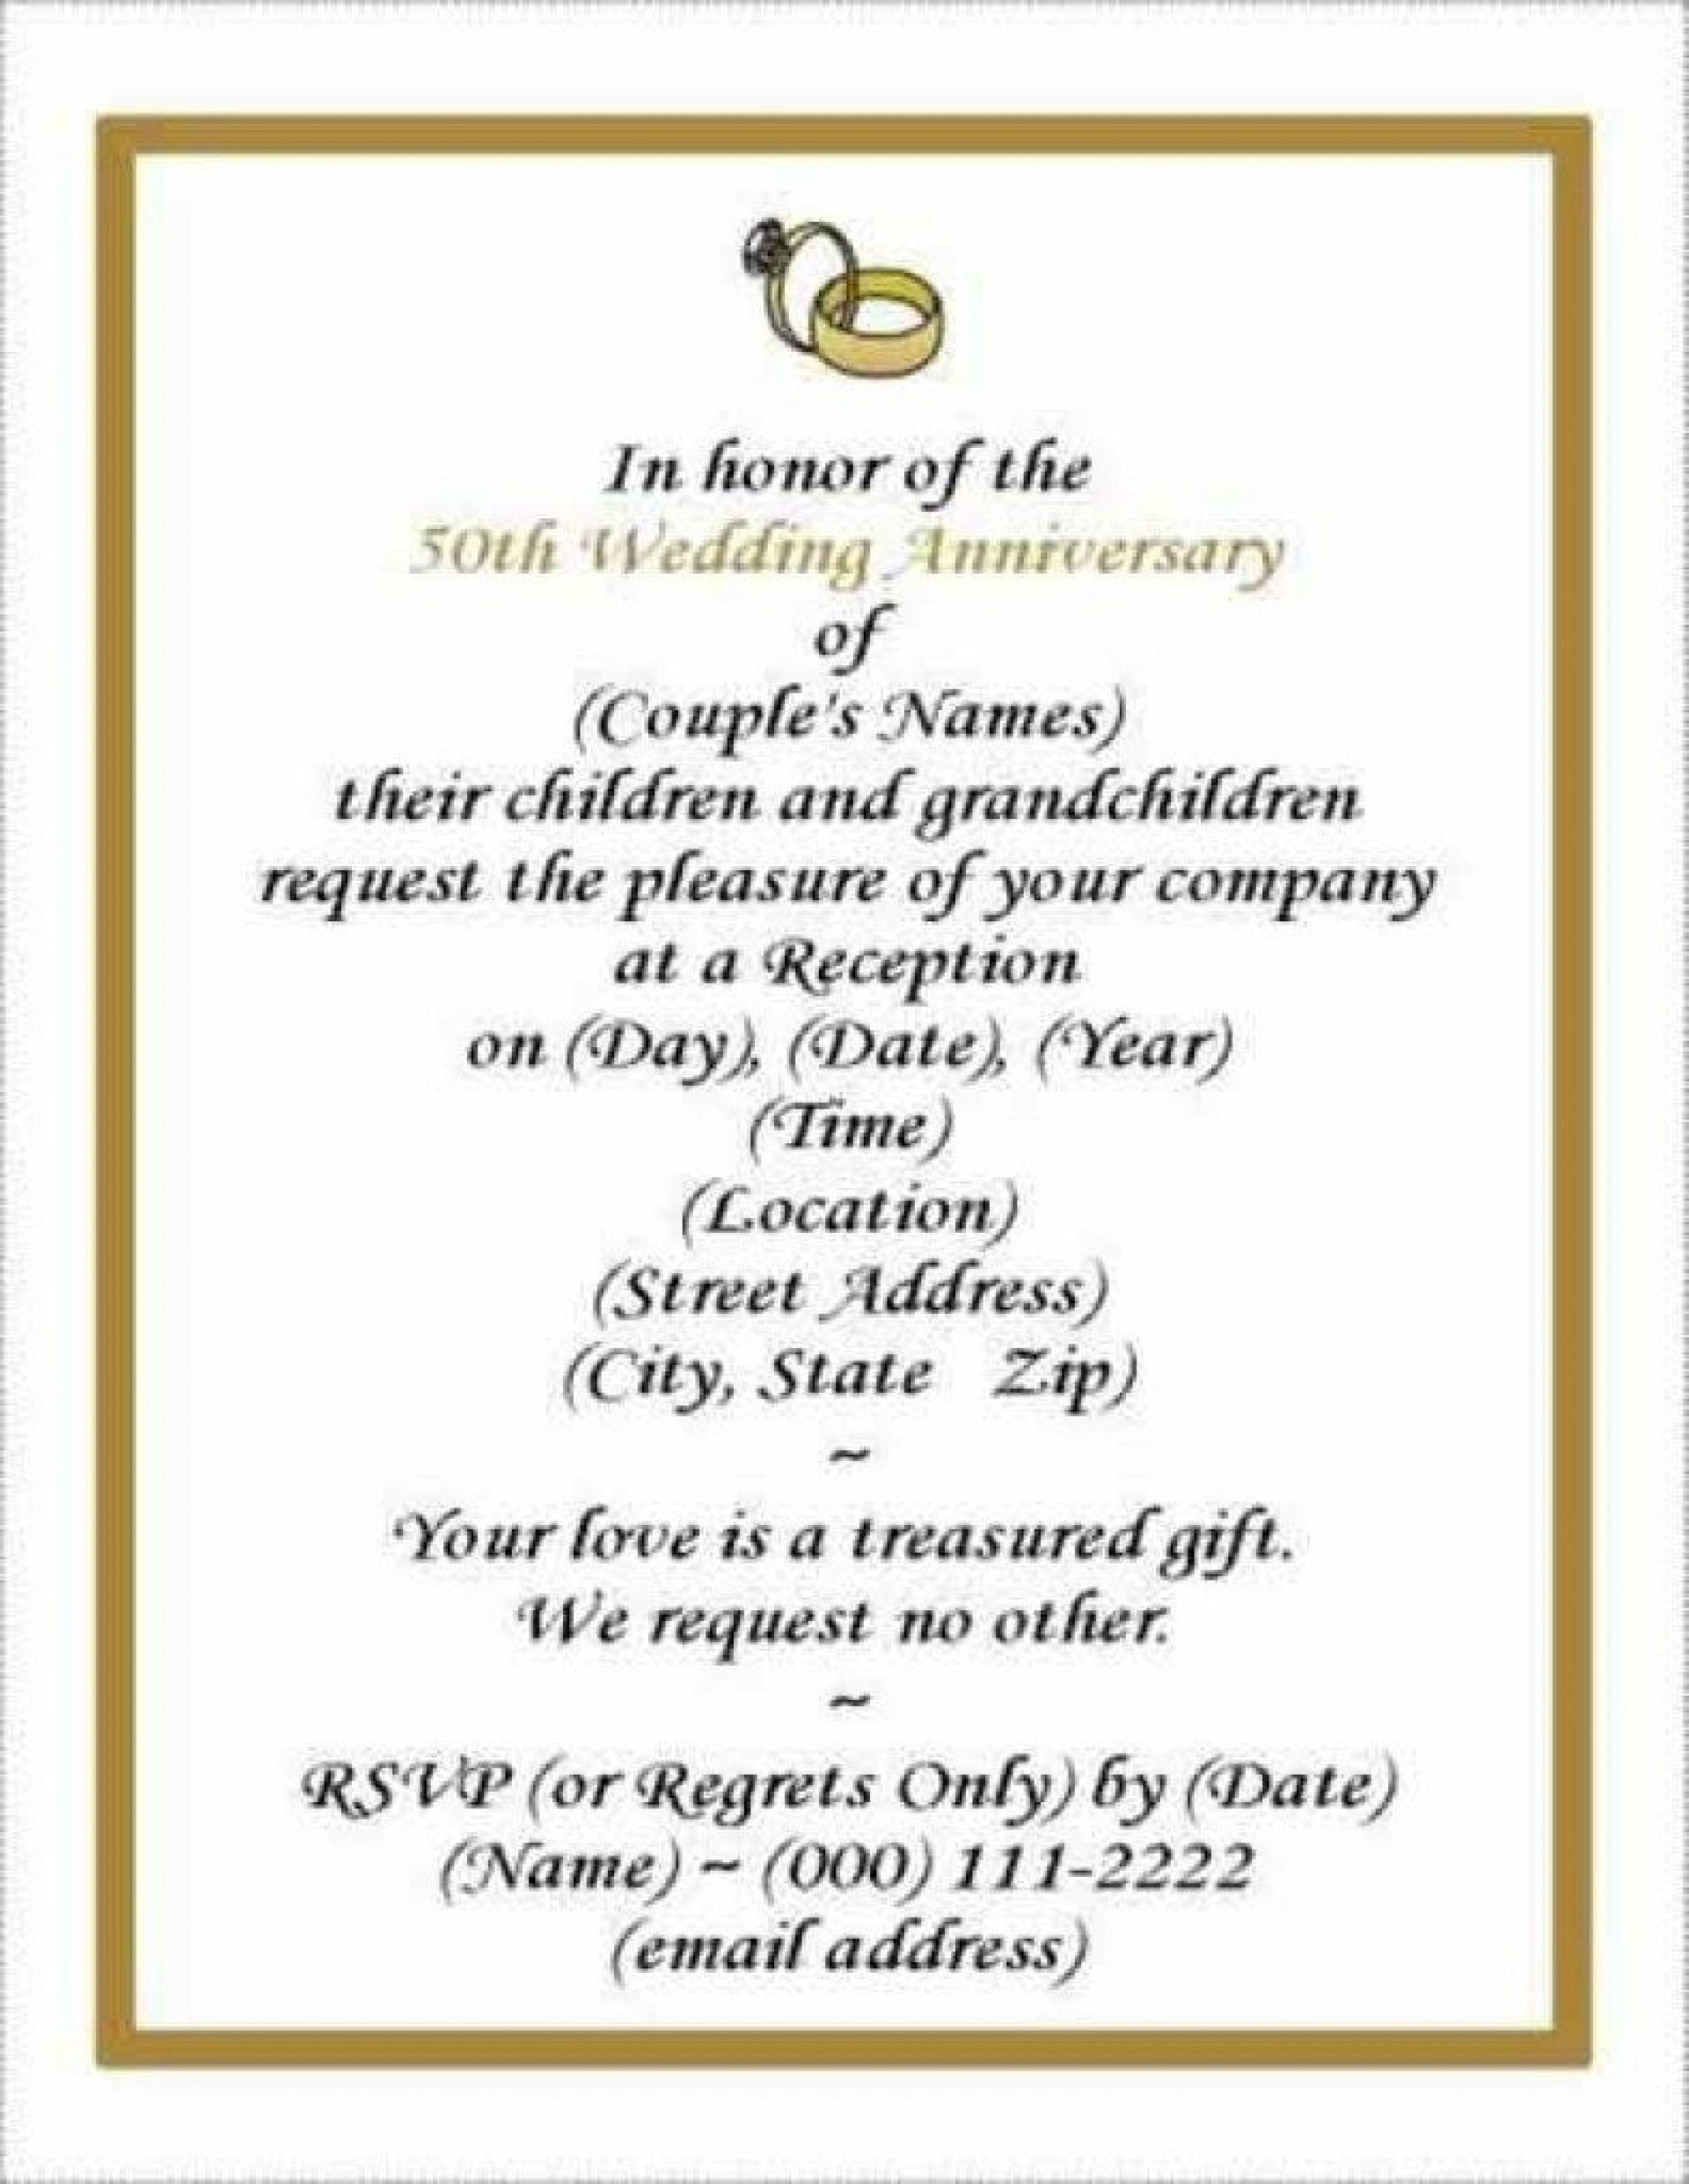 006 Sensational 50th Wedding Anniversary Invitation Template Free Image  Download Golden Microsoft Word1920